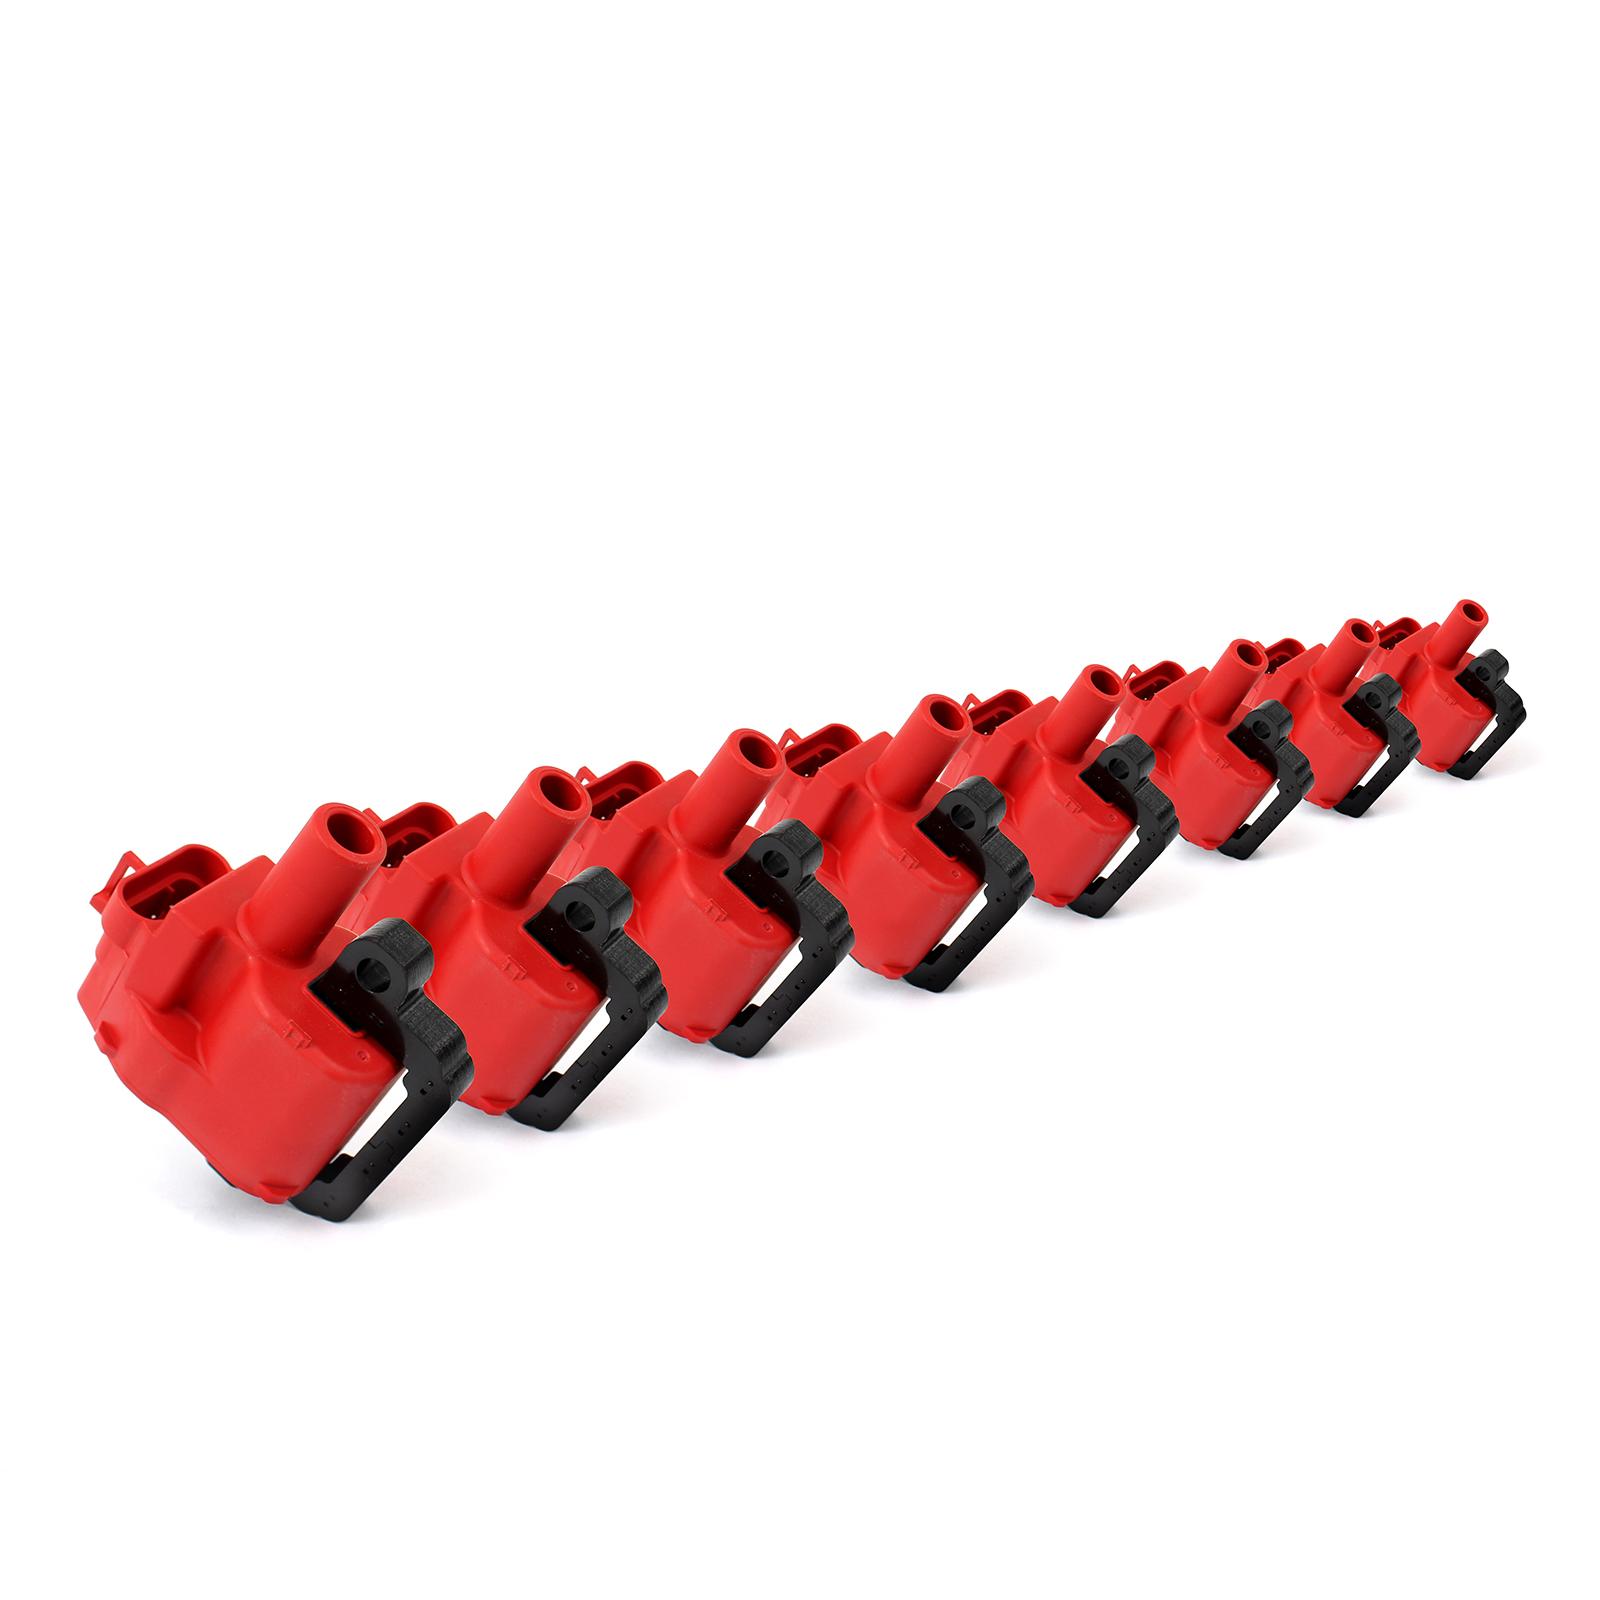 Compatible Ignition Coils Ballast Resistors Hotspark Electronic